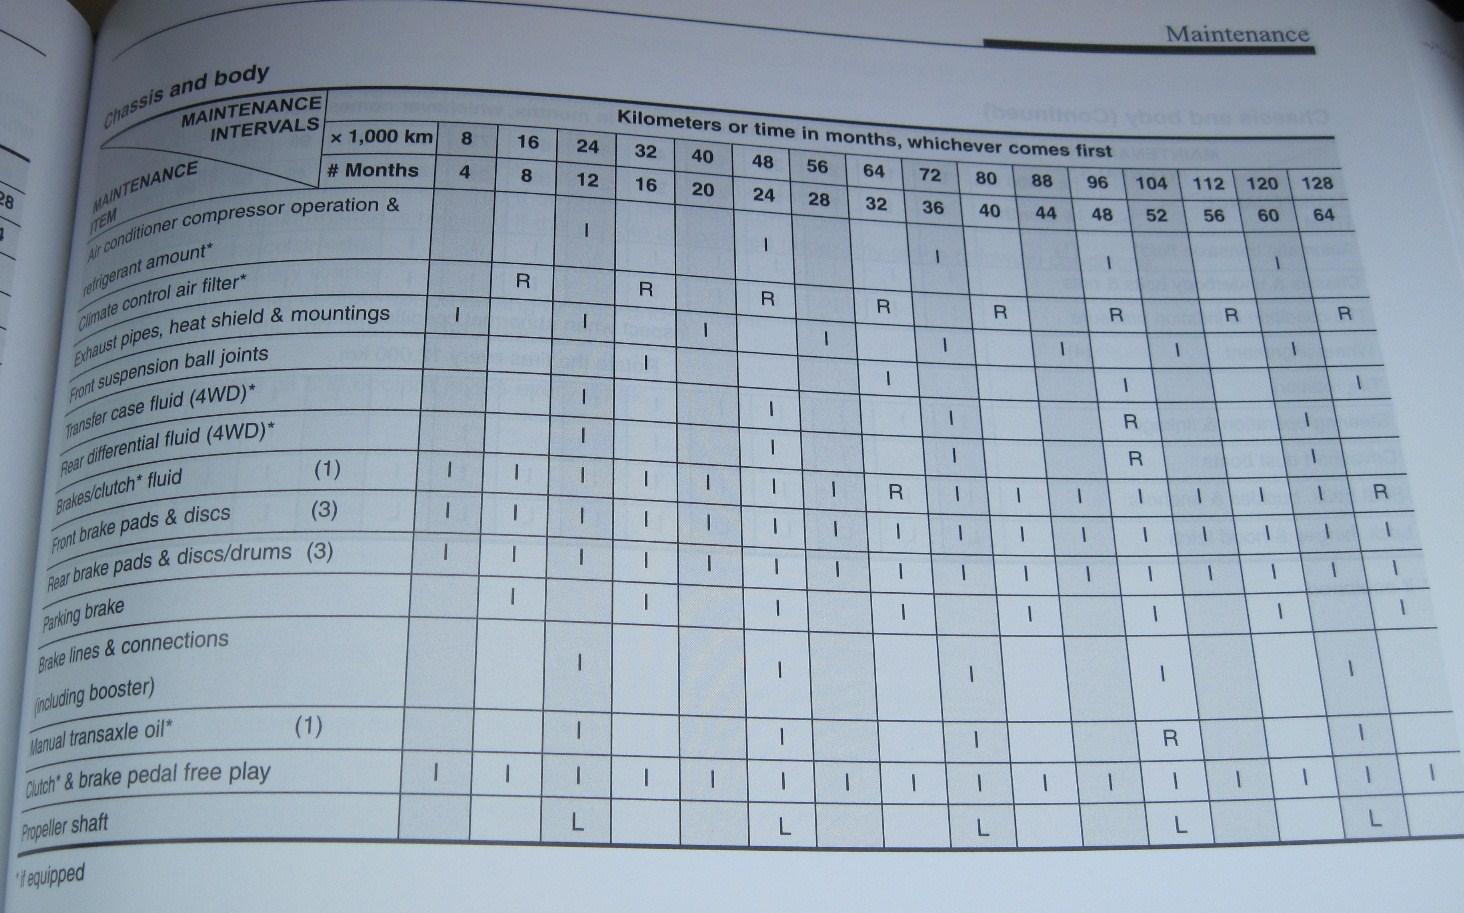 Honda Civic 2016 Maintenance Schedule Auxdelicesdirene Com